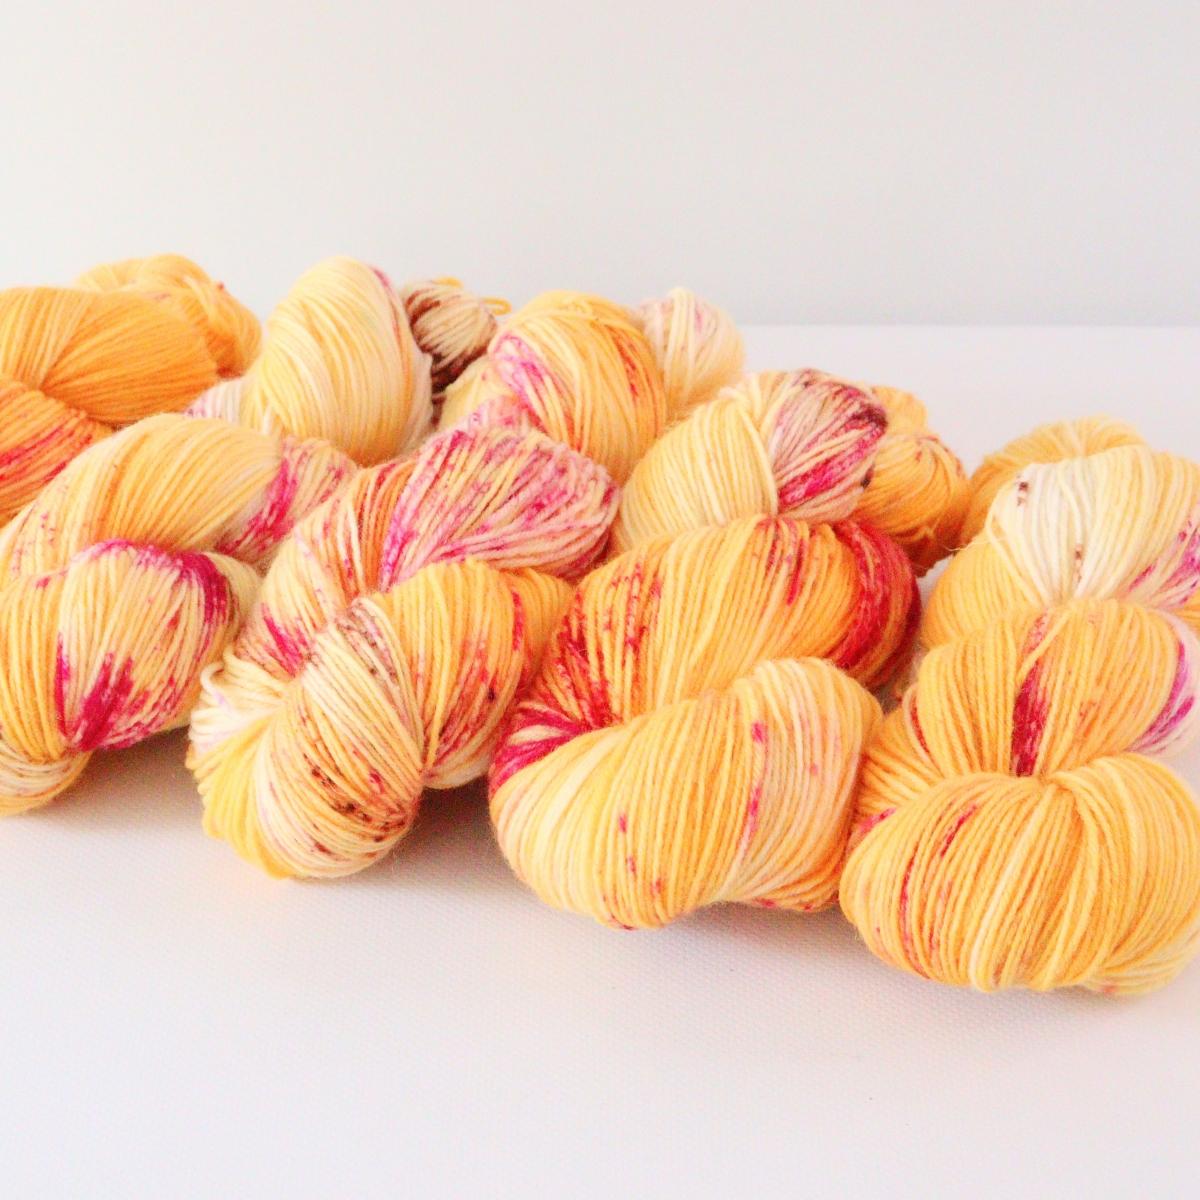 woodico.pro hand dyed yarn 077 5 1200x1200 - Hand dyed yarn / 077